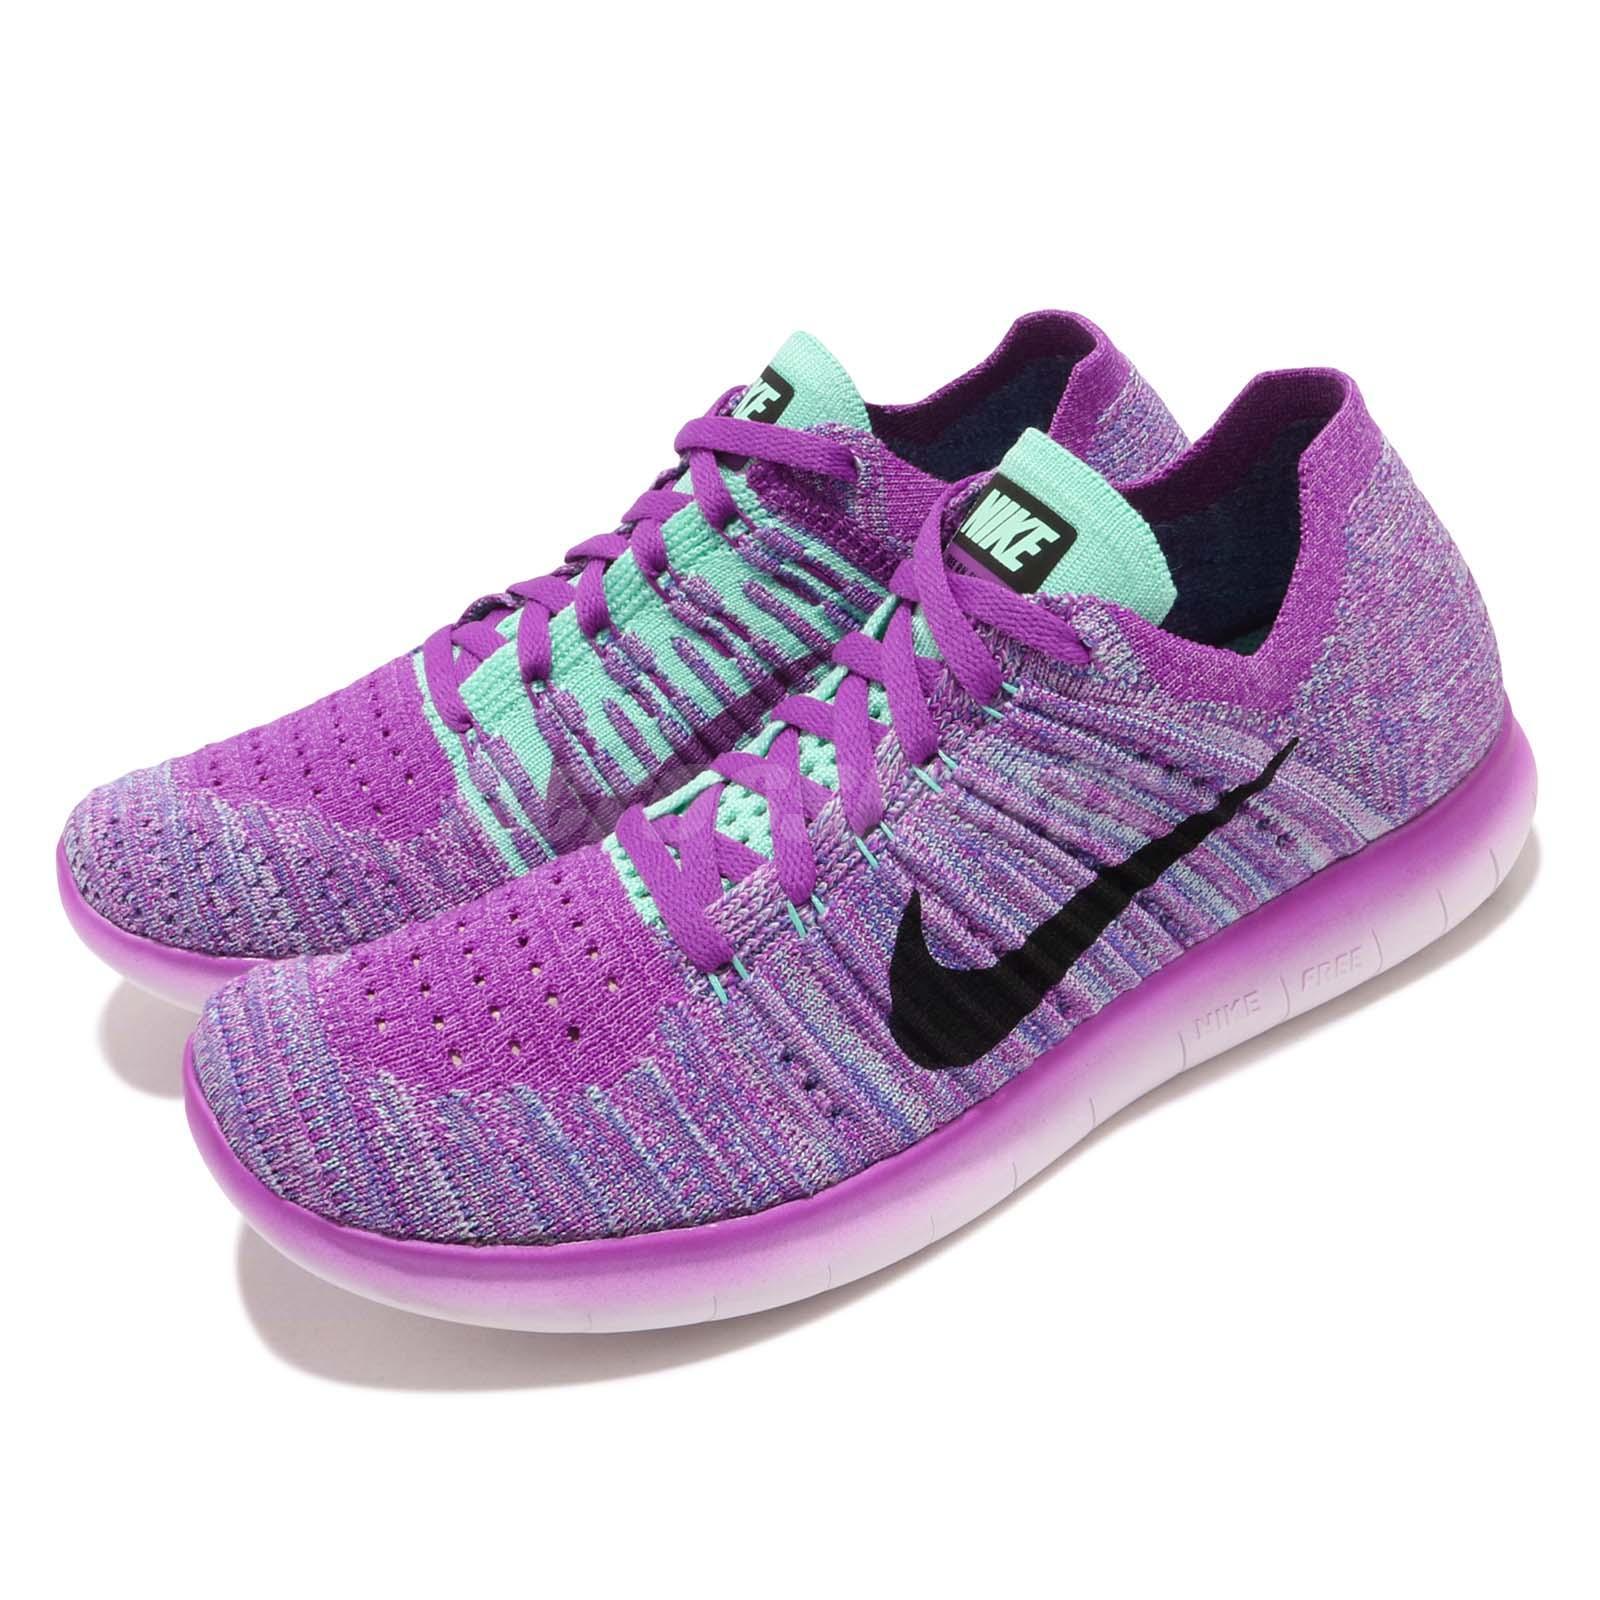 685da18e35f6 Details about Nike Free RN Flyknit GS Run Purple Black Kids Womens Running  Shoes 834363-500